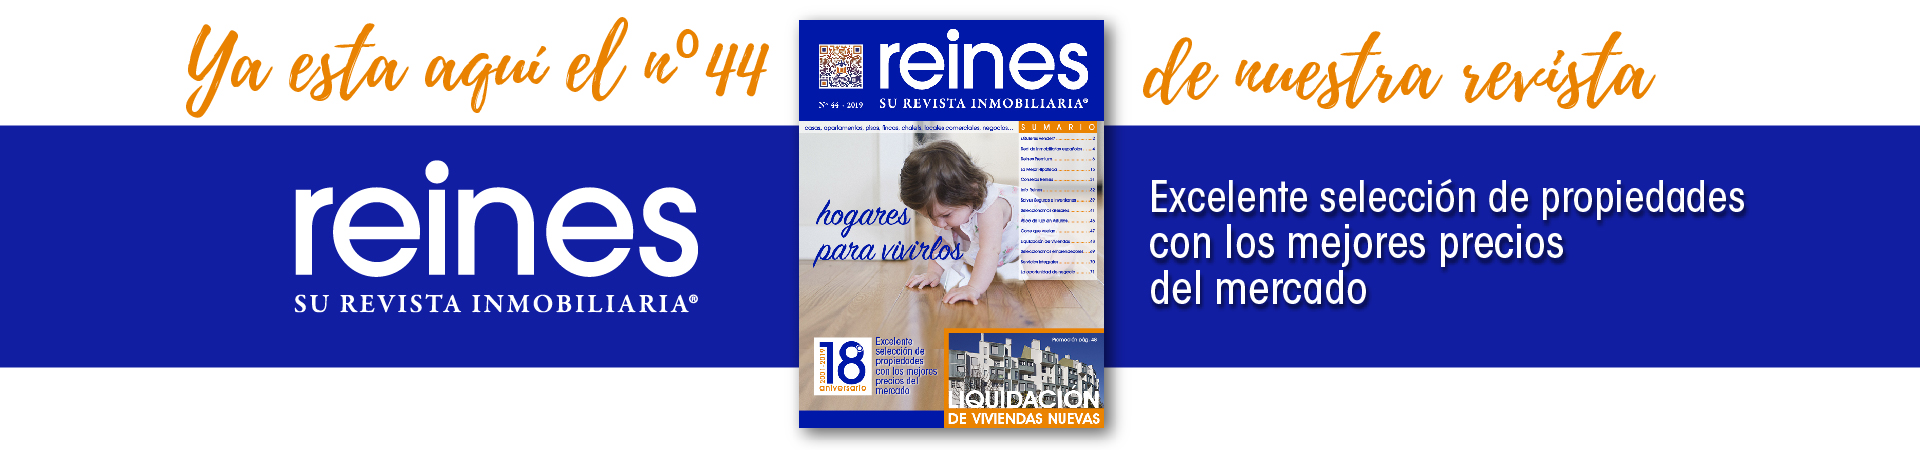 Revista Reines Grupo Inmobiliario